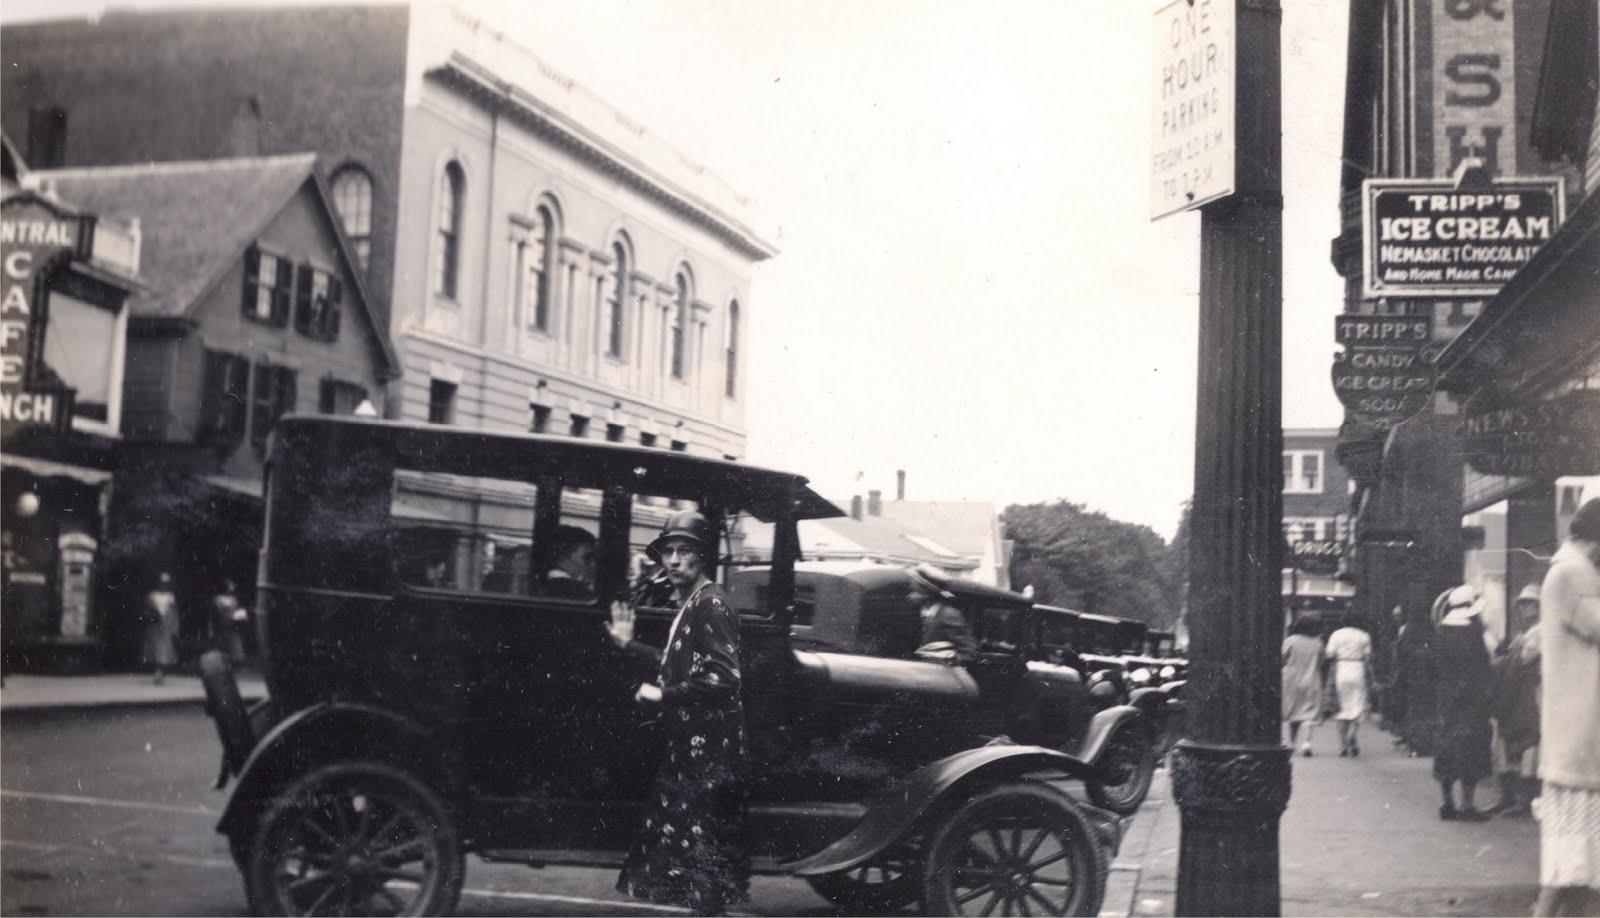 Downtown Middleborough 1932